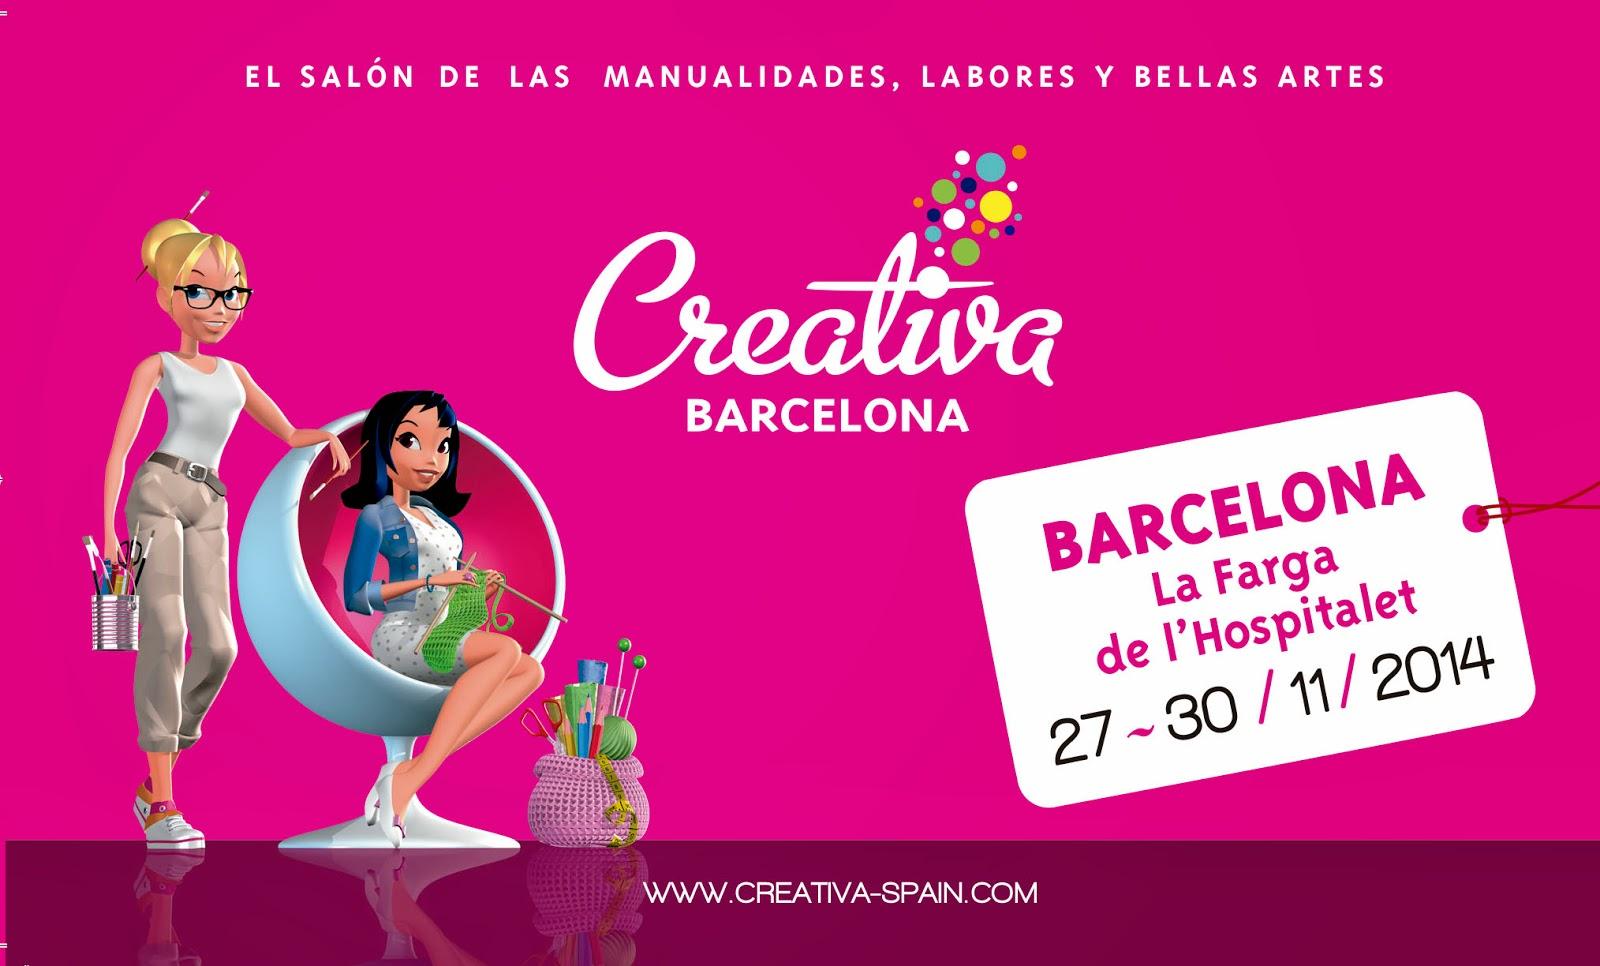 Creativa Barcelona Patchworky Manualidades